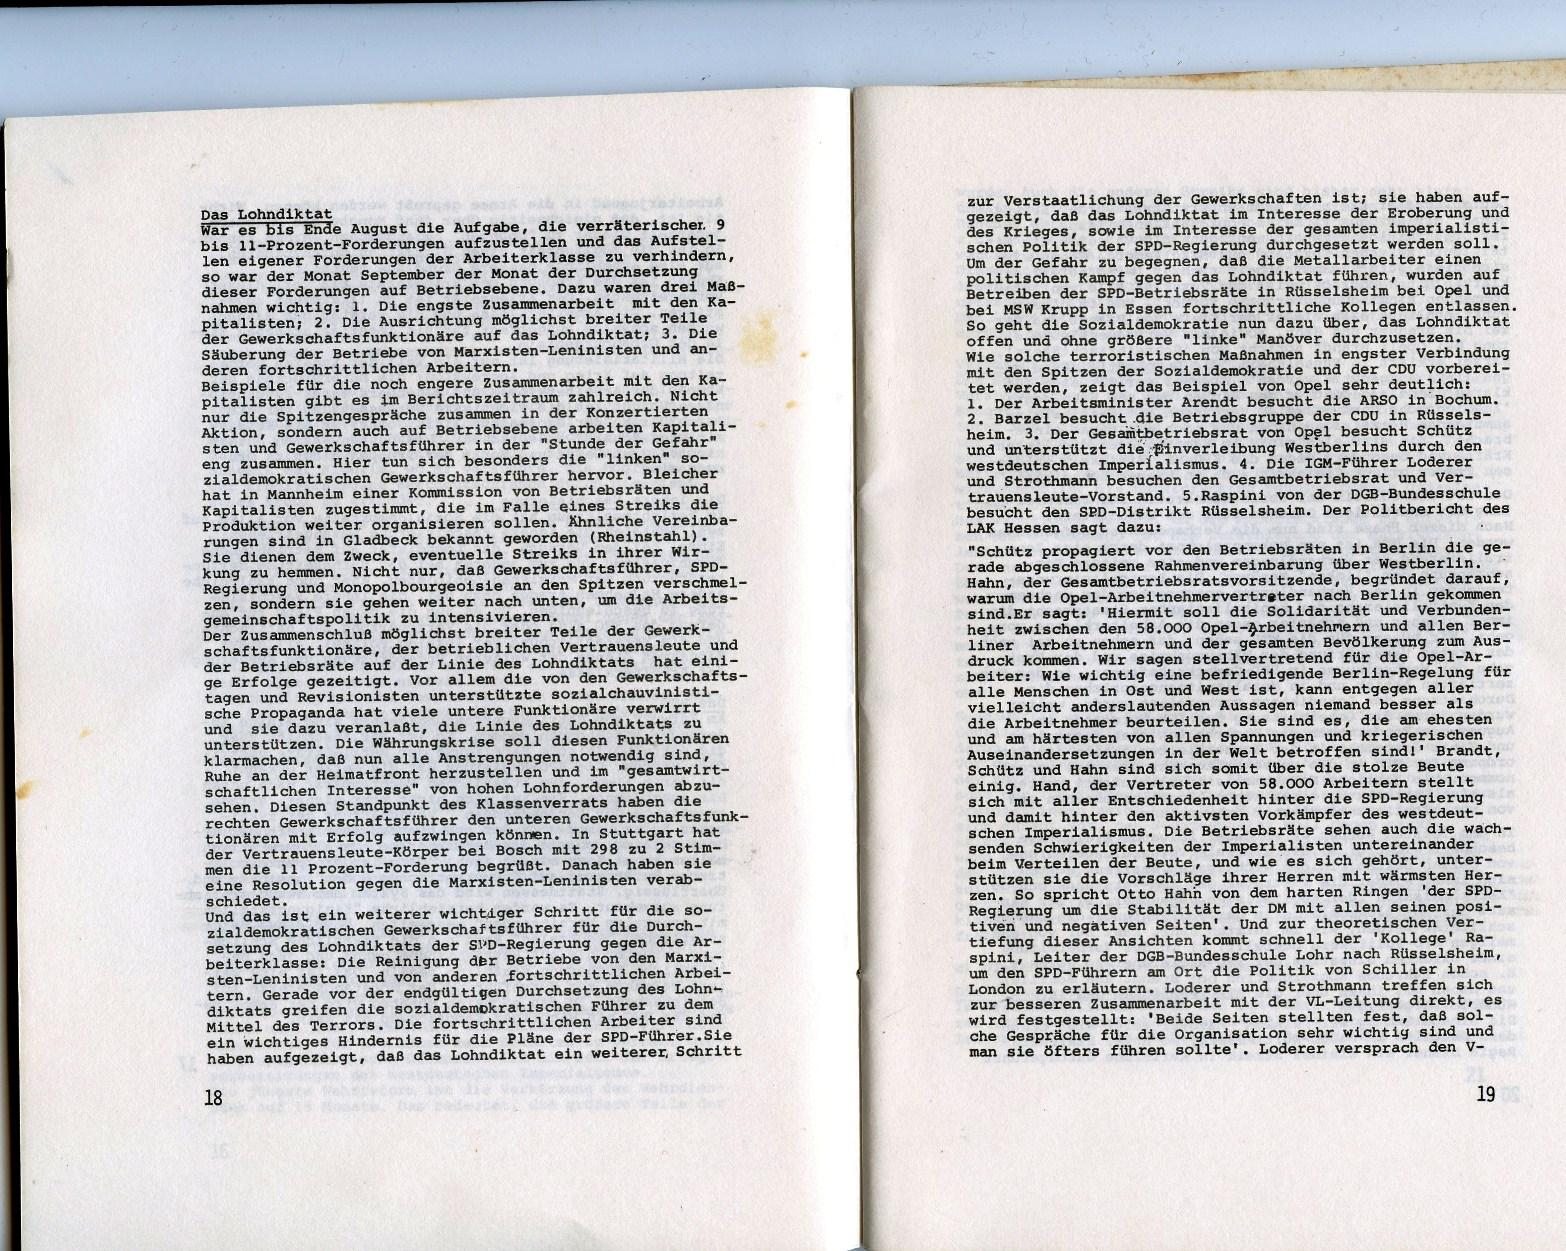 ZB_Parteiarbeiter_1971_09_10